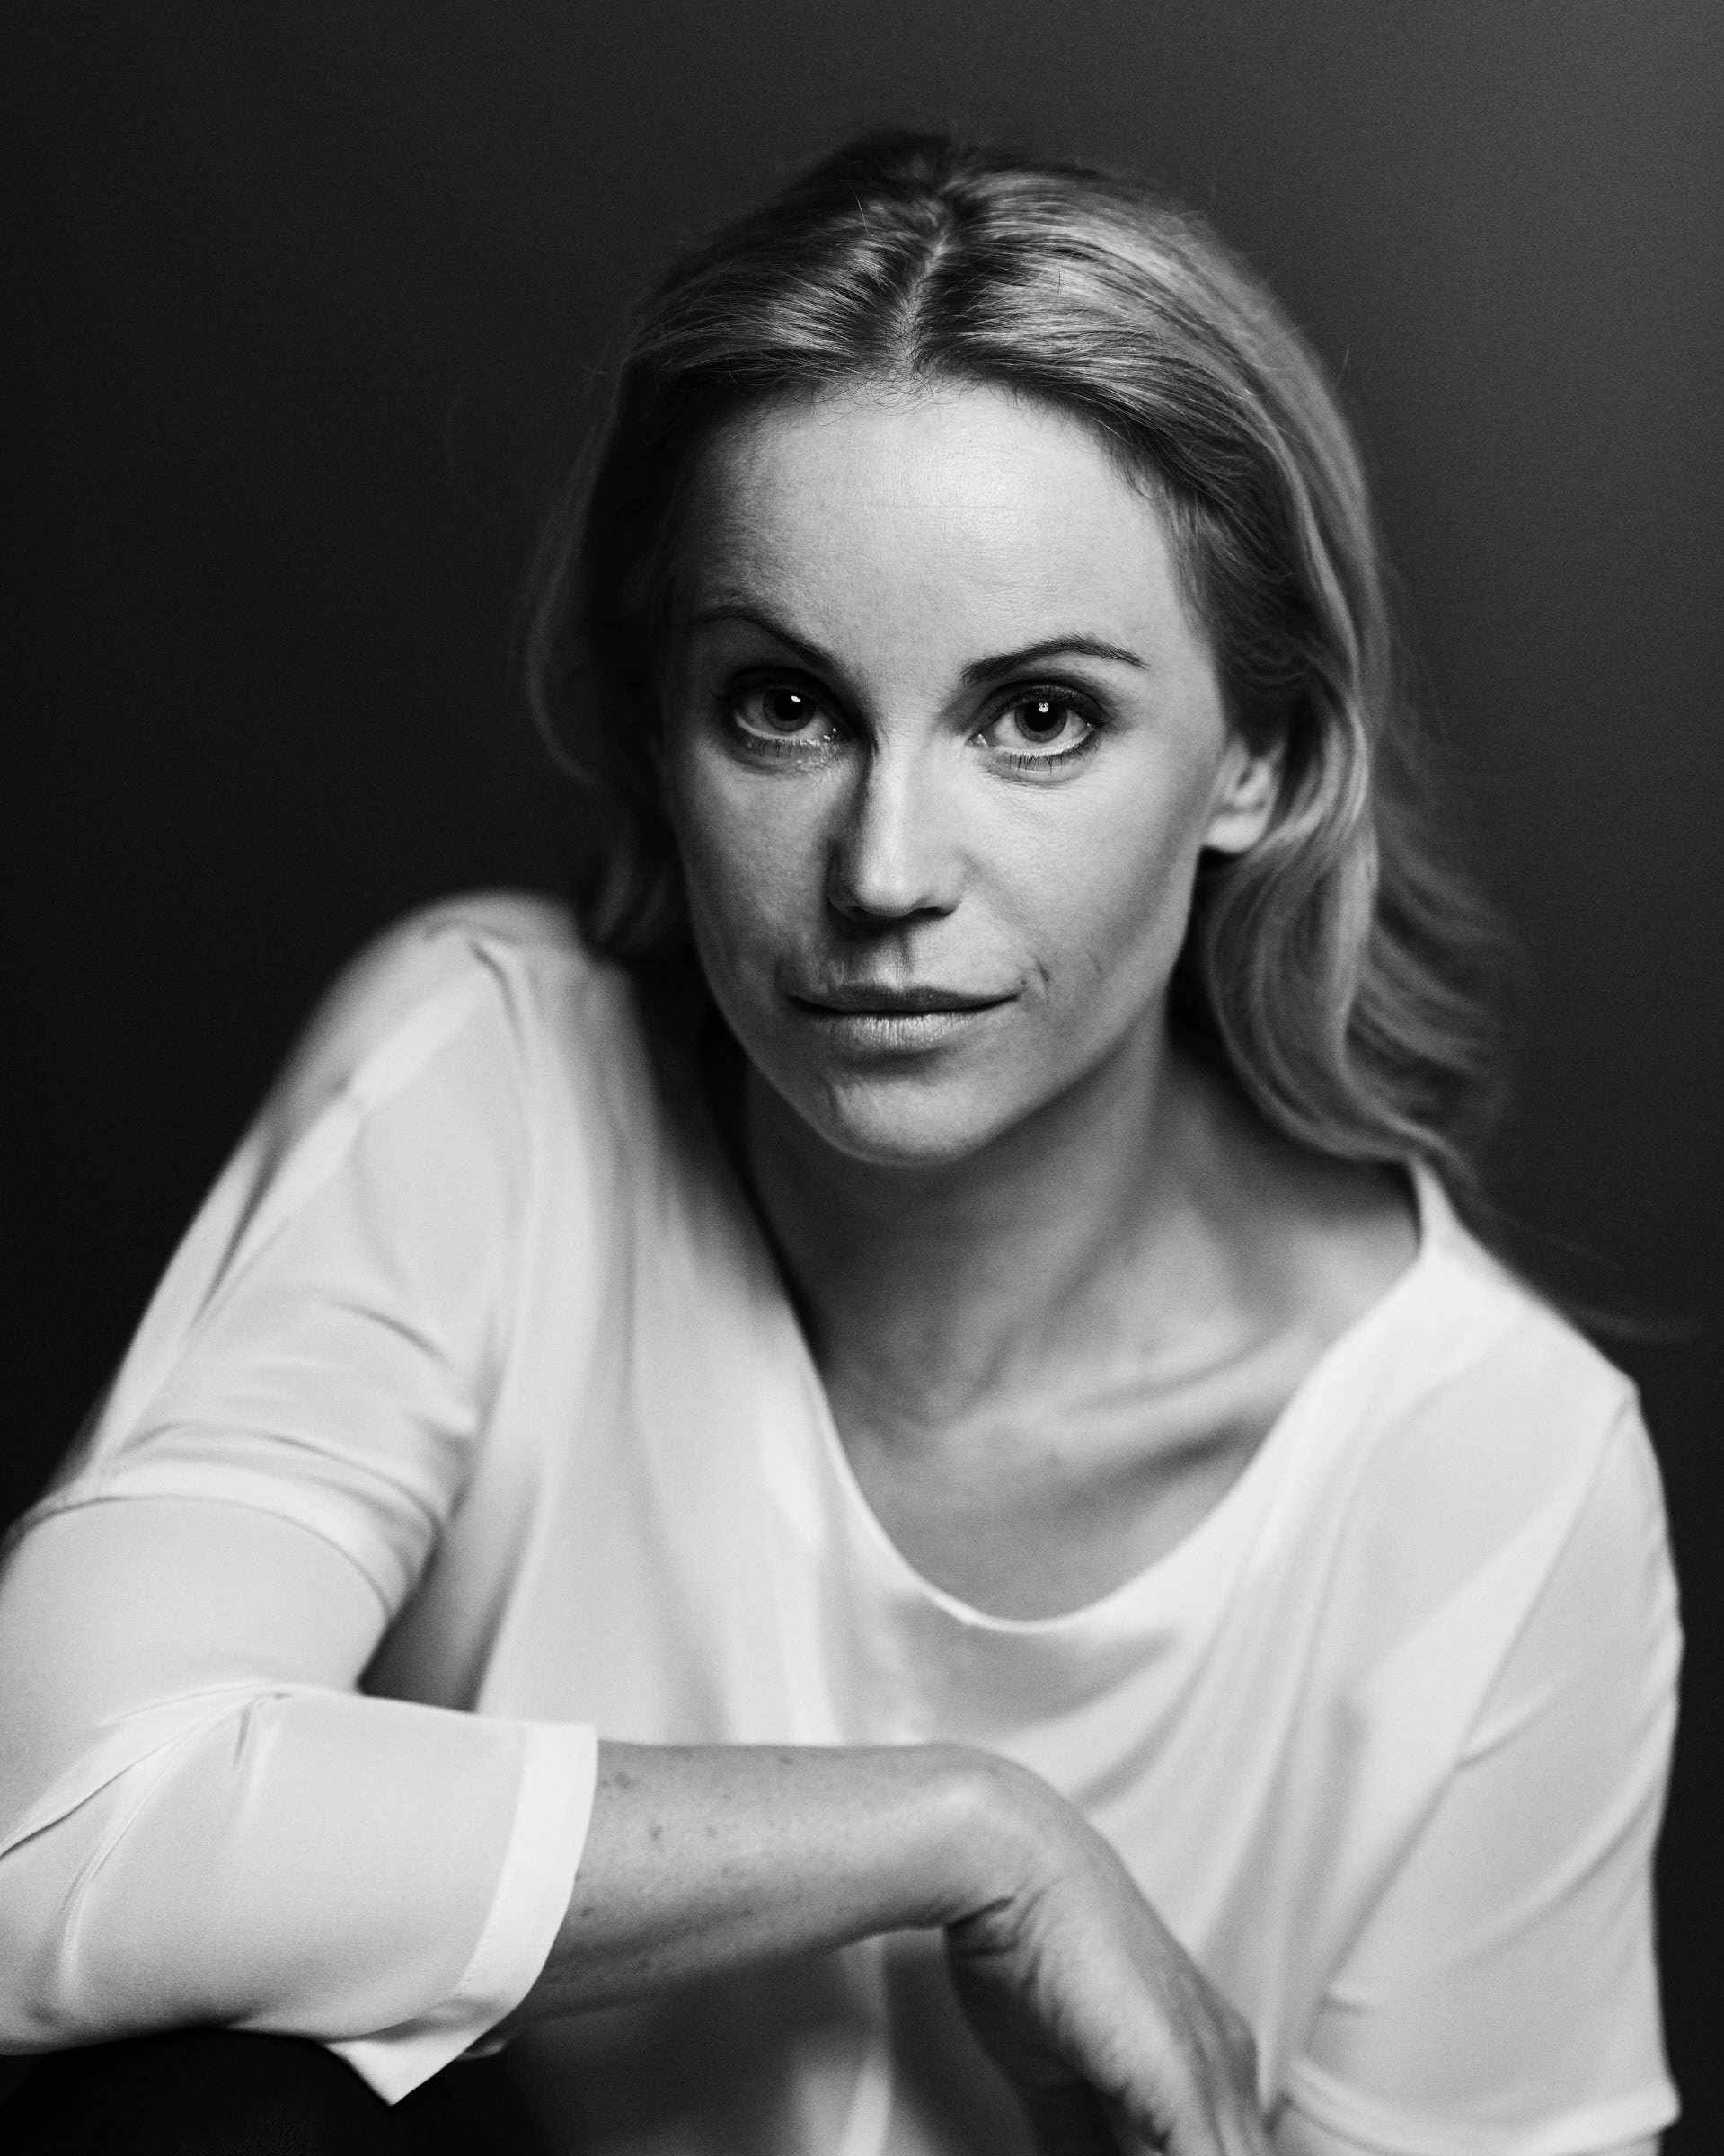 Portfolio_475_Portrait of Sofia Helin_by_KRISTOFER SAMUELSSON PHOTOGRAPHY.jpg